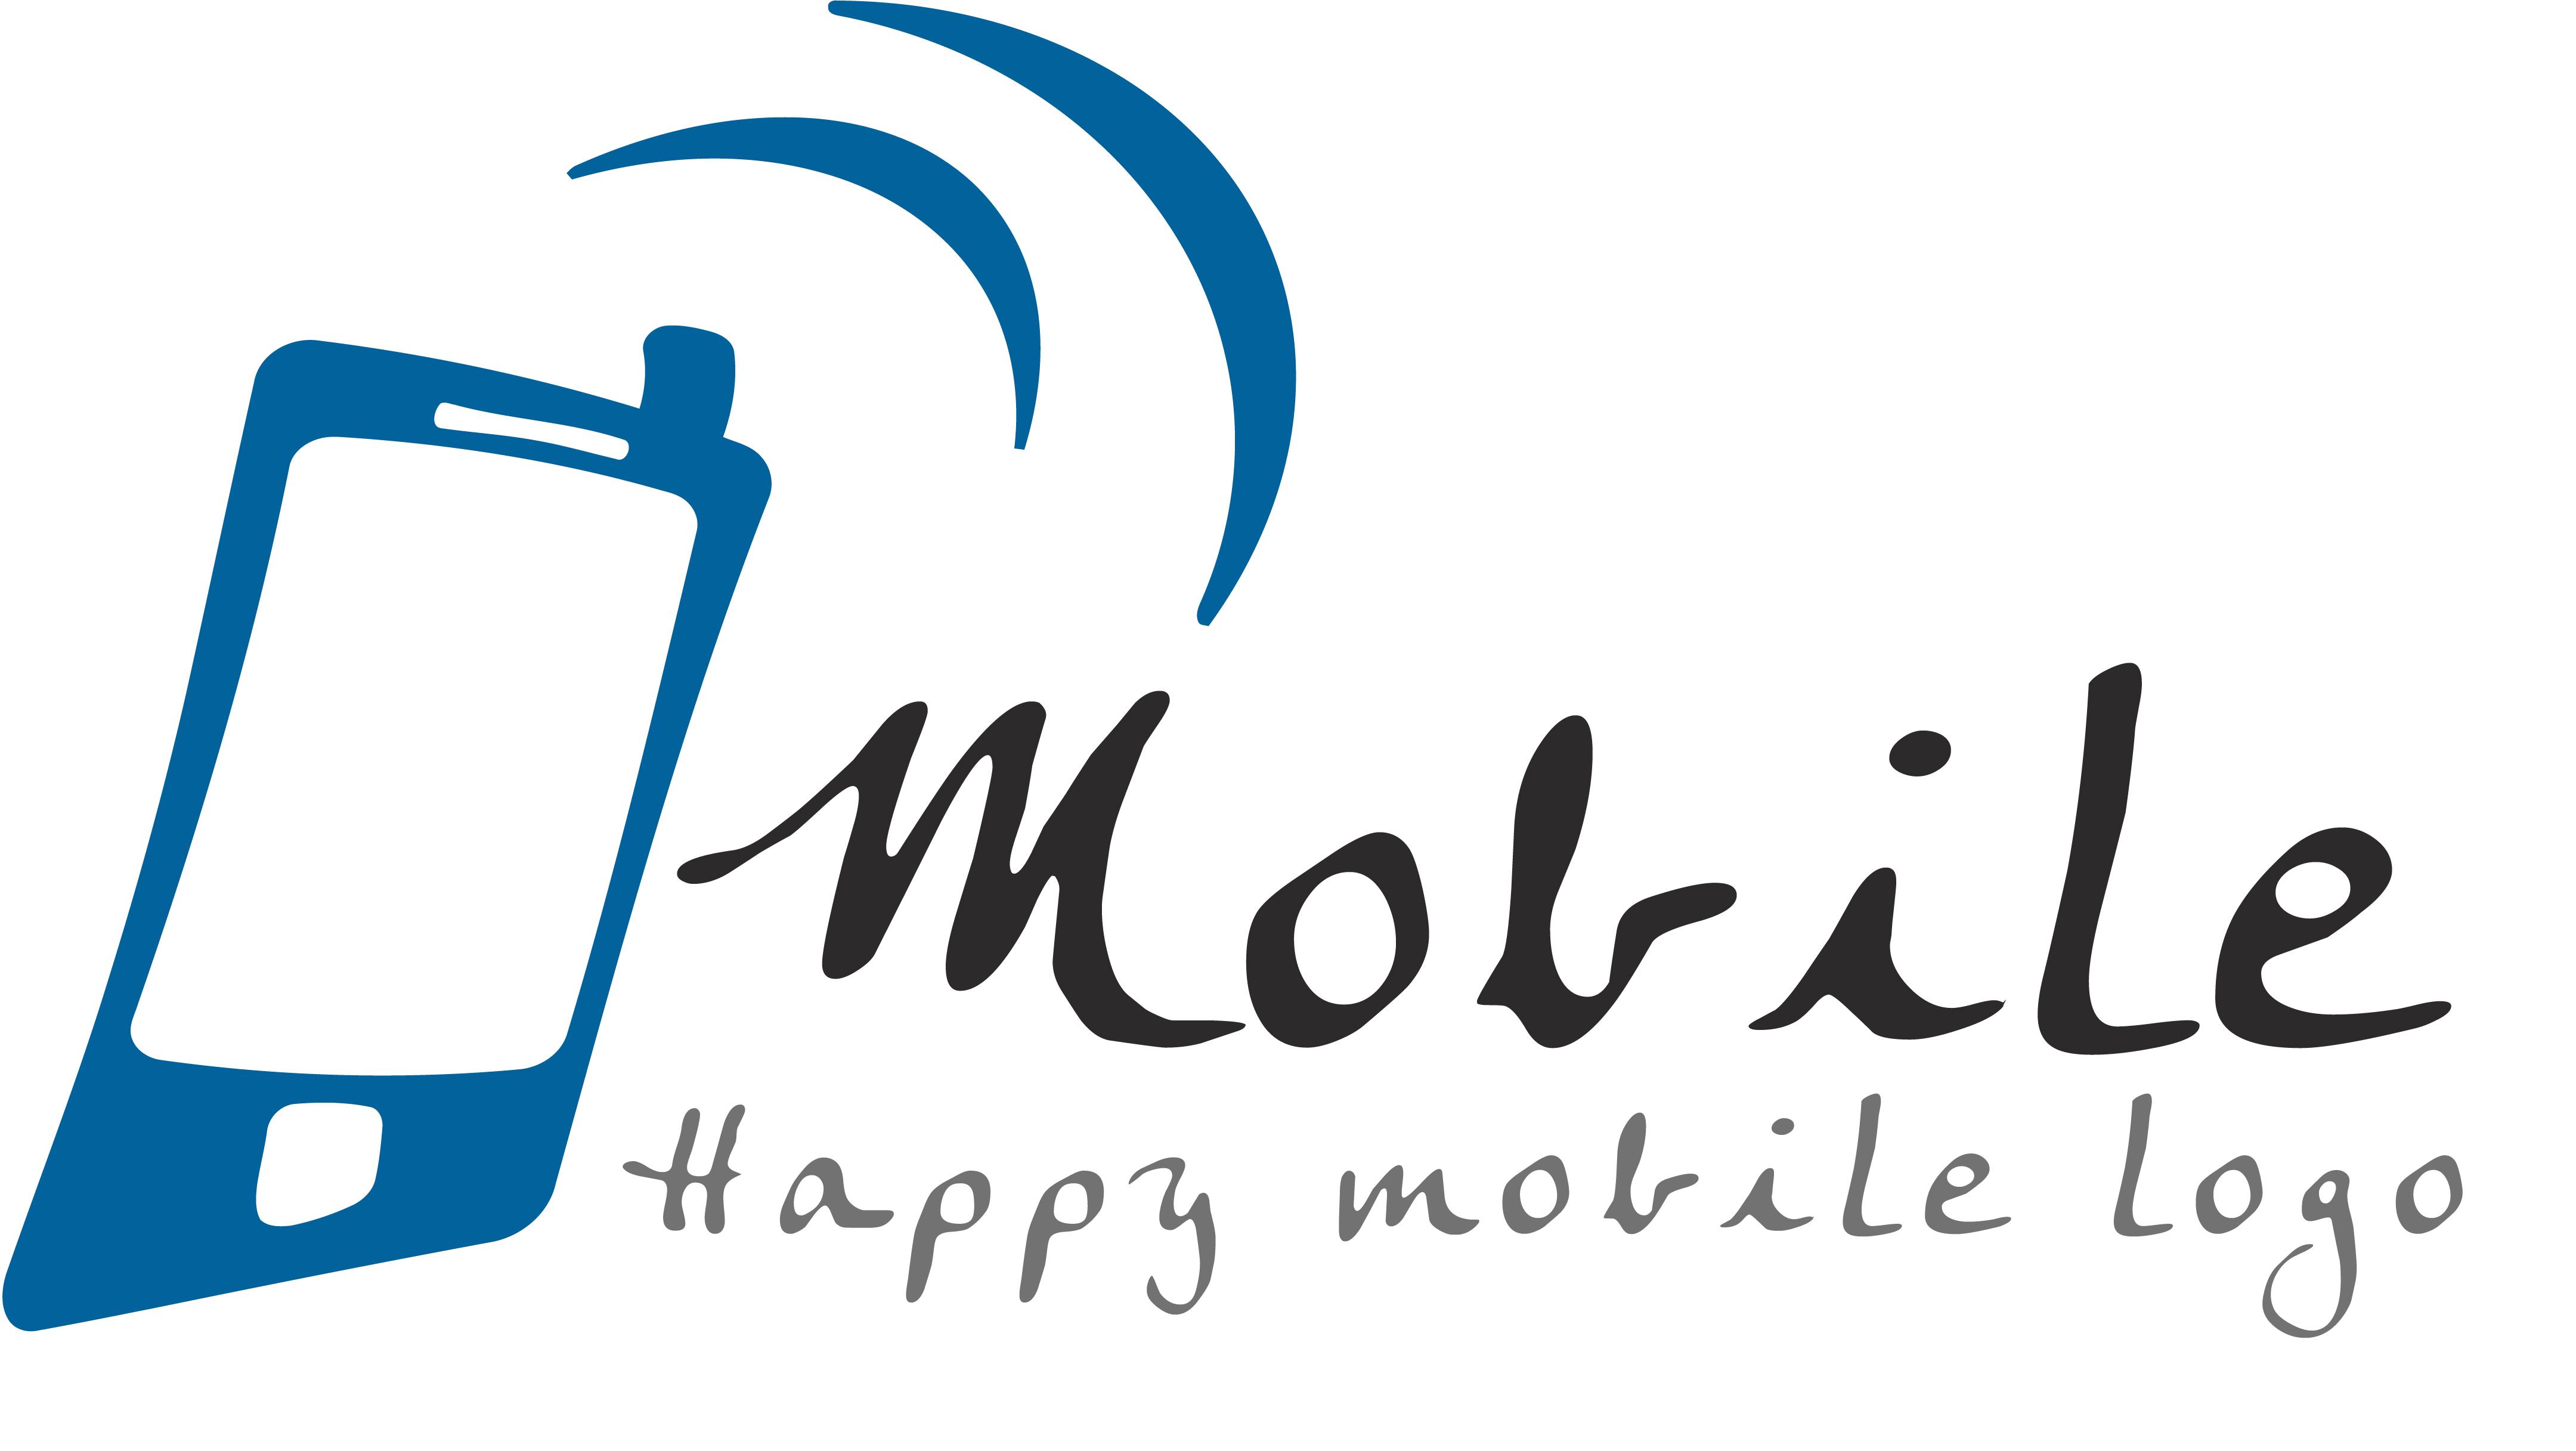 Mobile logos for Mobile logo